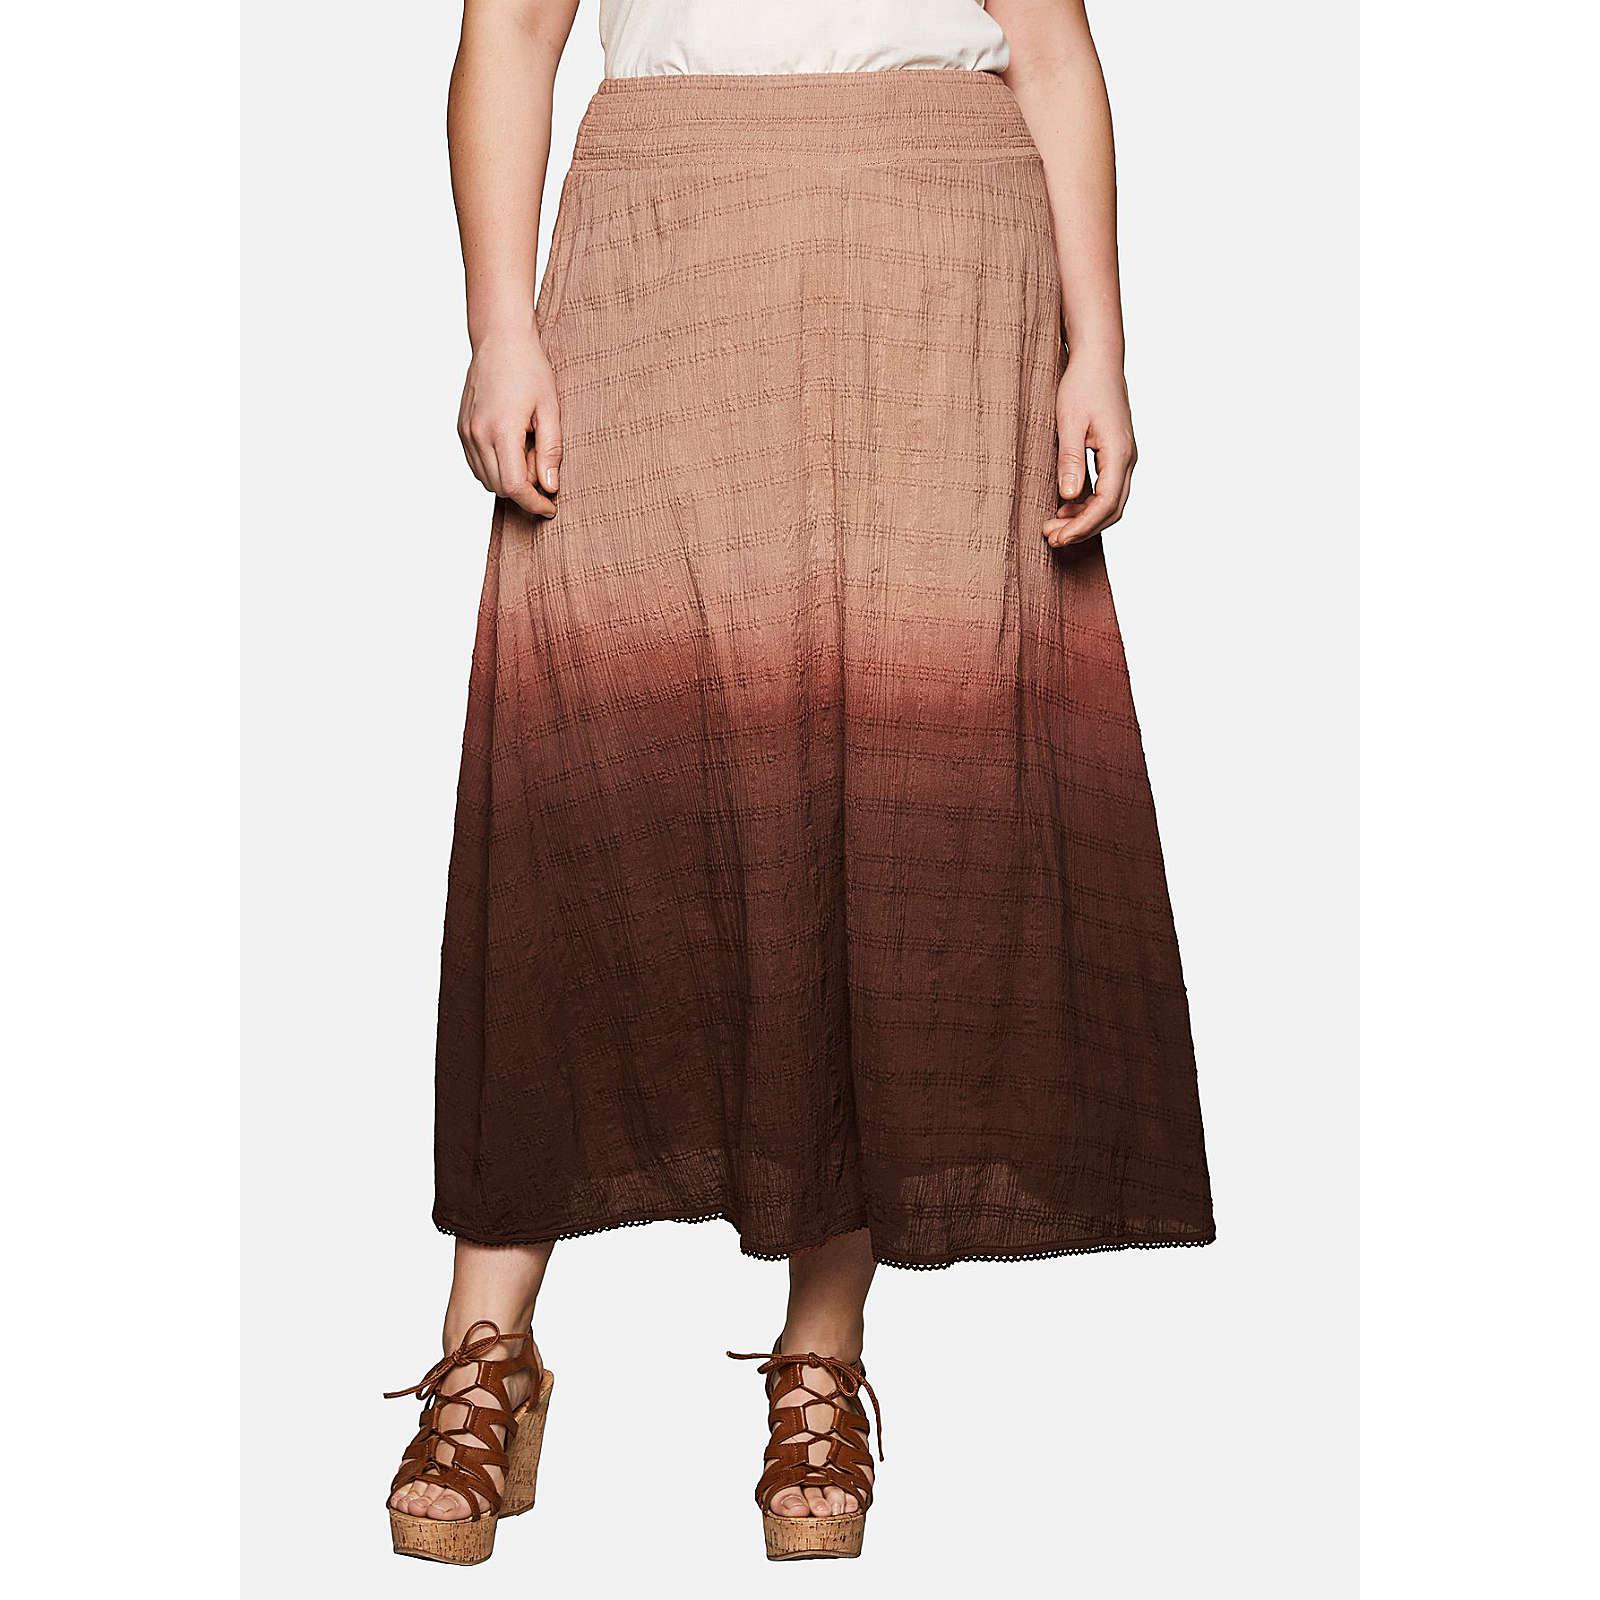 sheego Batikrock im angesagten Boho-Style Röcke braun Damen Gr. 48